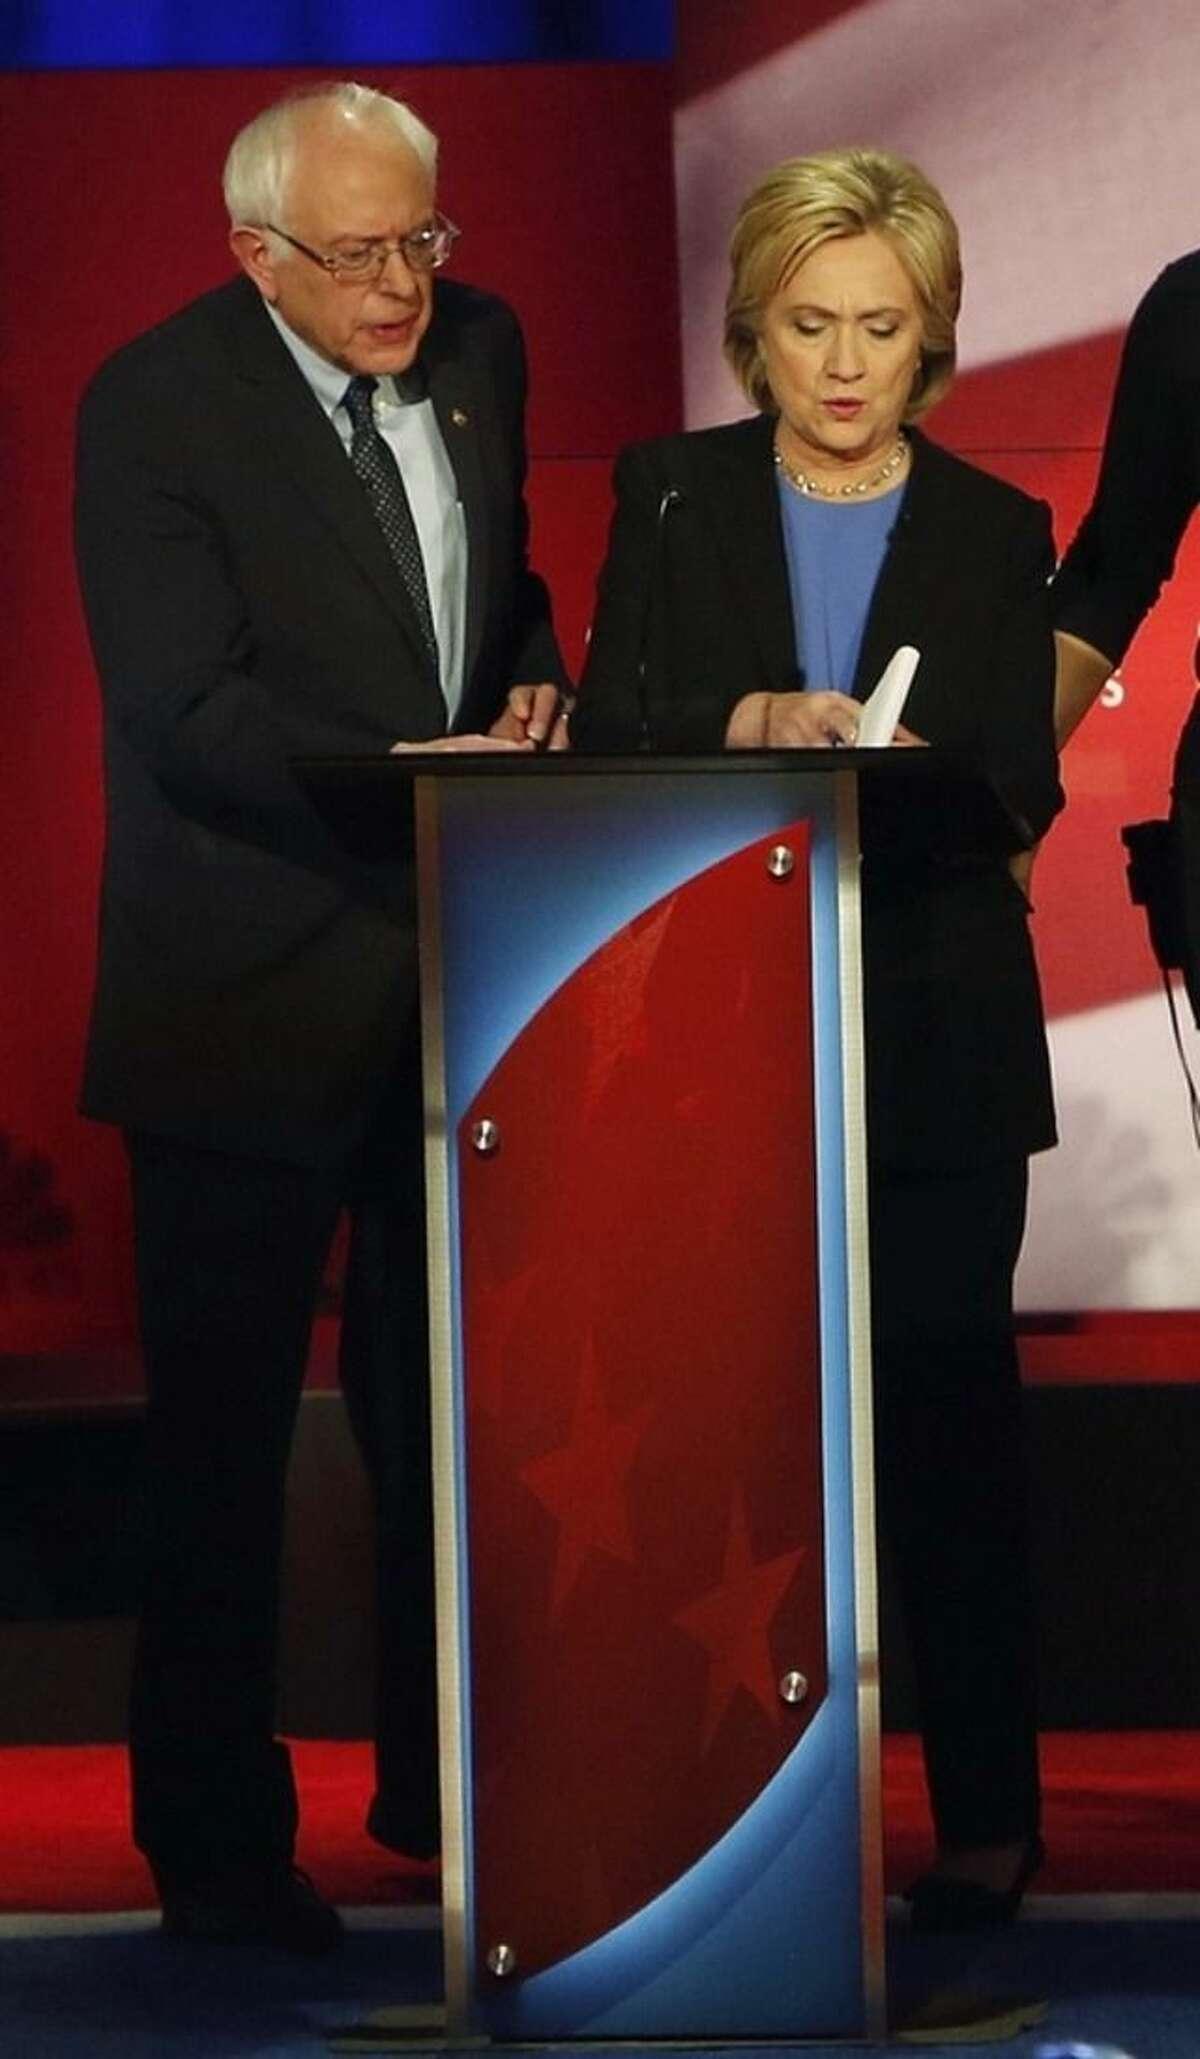 Democratic presidential candidates, Hillary Clinton and Sen. Bernie Sanders, I-Vt. confer during a break at the NBC, YouTube Democratic presidential debate at the Gaillard Center, Sunday, Jan. 17, 2016, in Charleston, S.C. (AP Photo/Mic Smith)